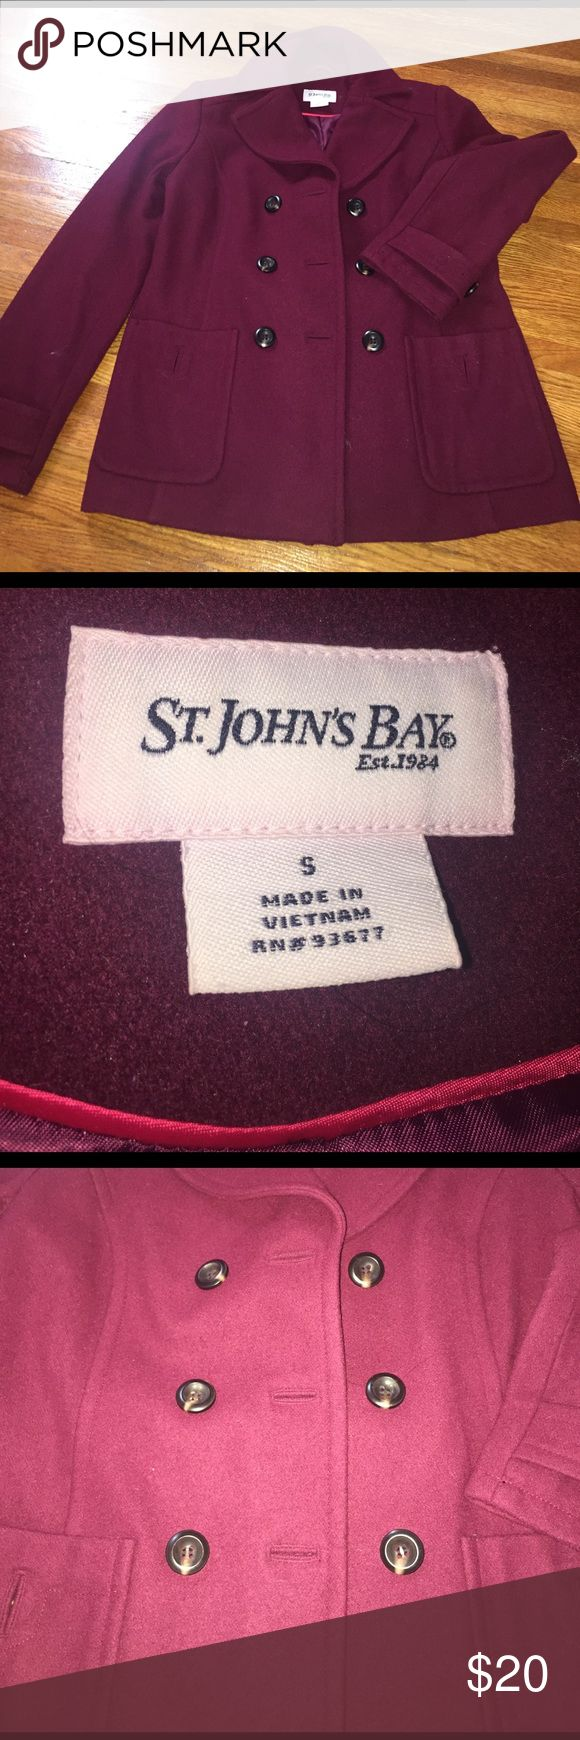 Burgundy Peacoat Peacoat, worn 2 times! Great fit👍🏻 st jons bay Jackets & Coats Pea Coats